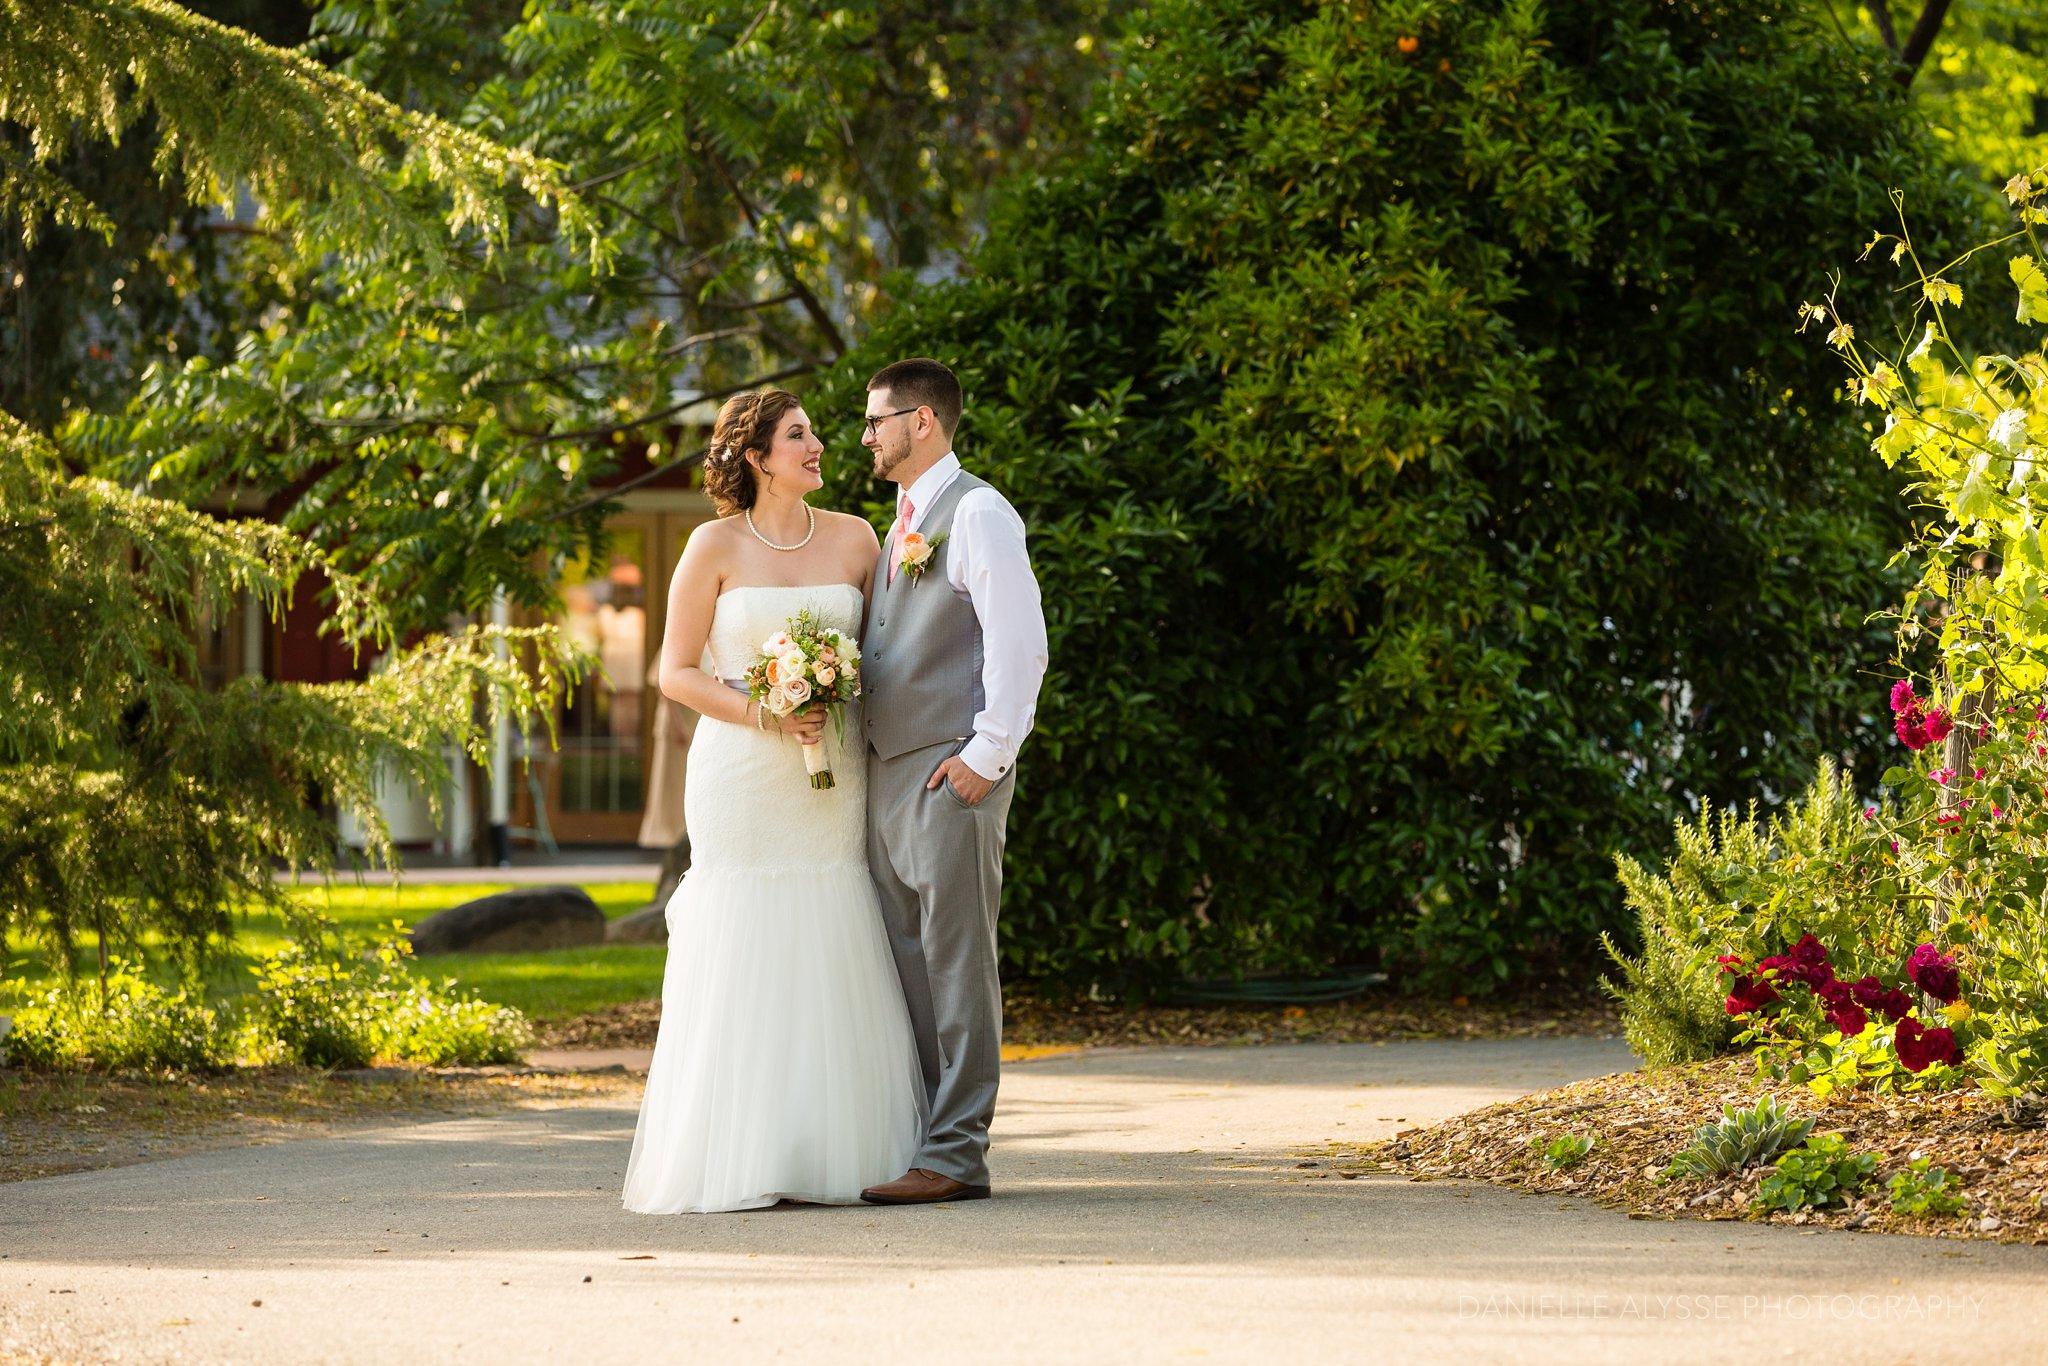 170507_blog_megan_david_wedding_loomis_flower_farm_inn_danielle_alysse_photography_sacramento_photographer0389_WEB.jpg